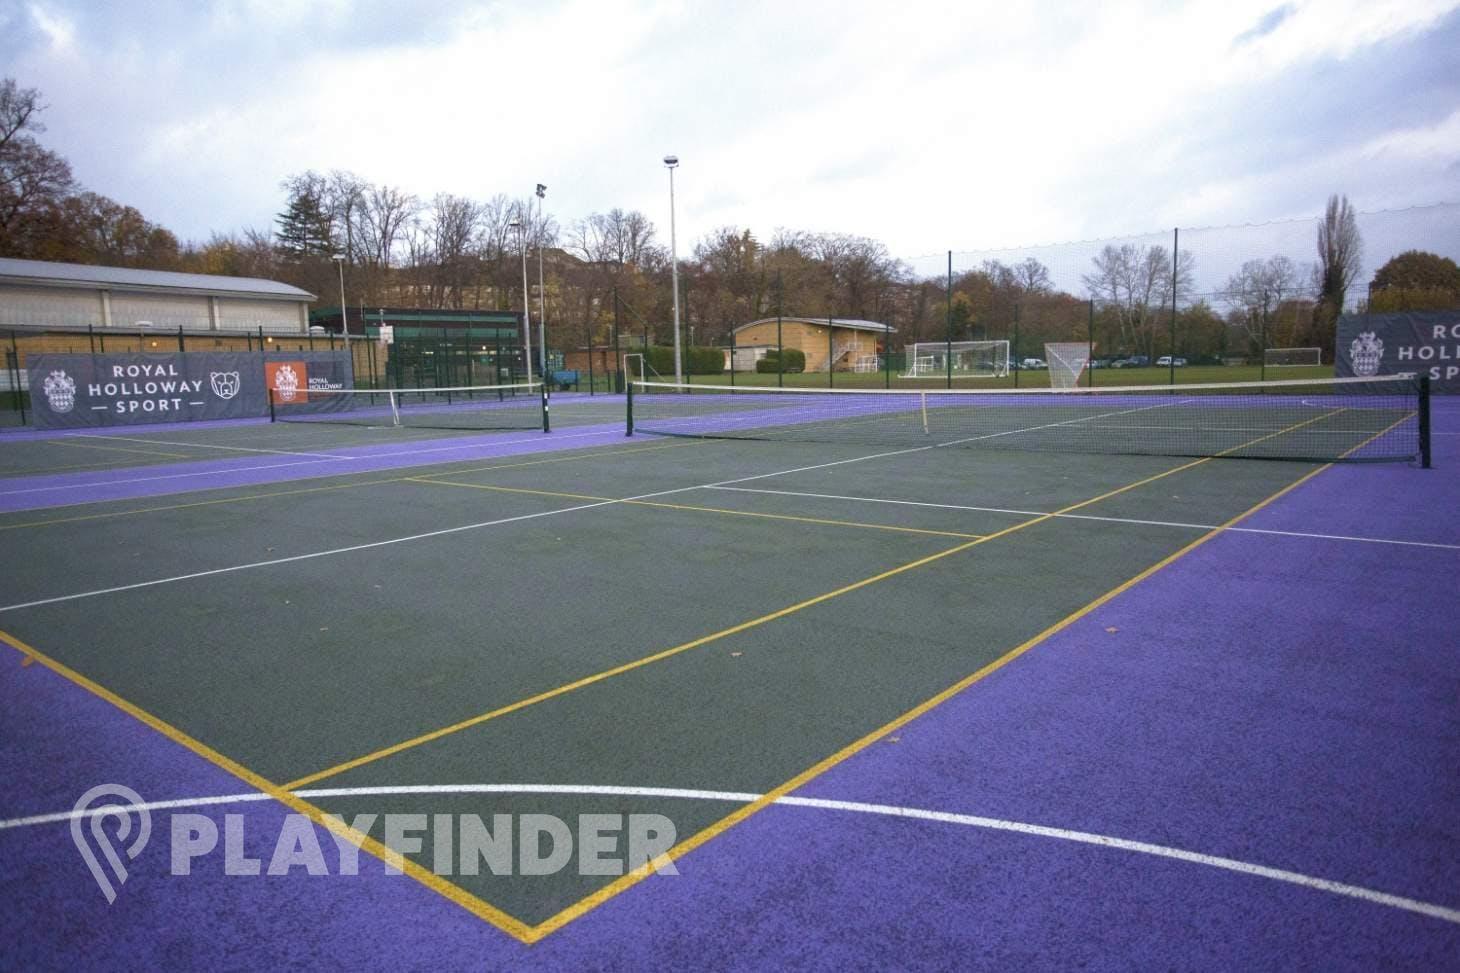 Royal Holloway University Sports Centre Outdoor | Hard (macadam) netball court